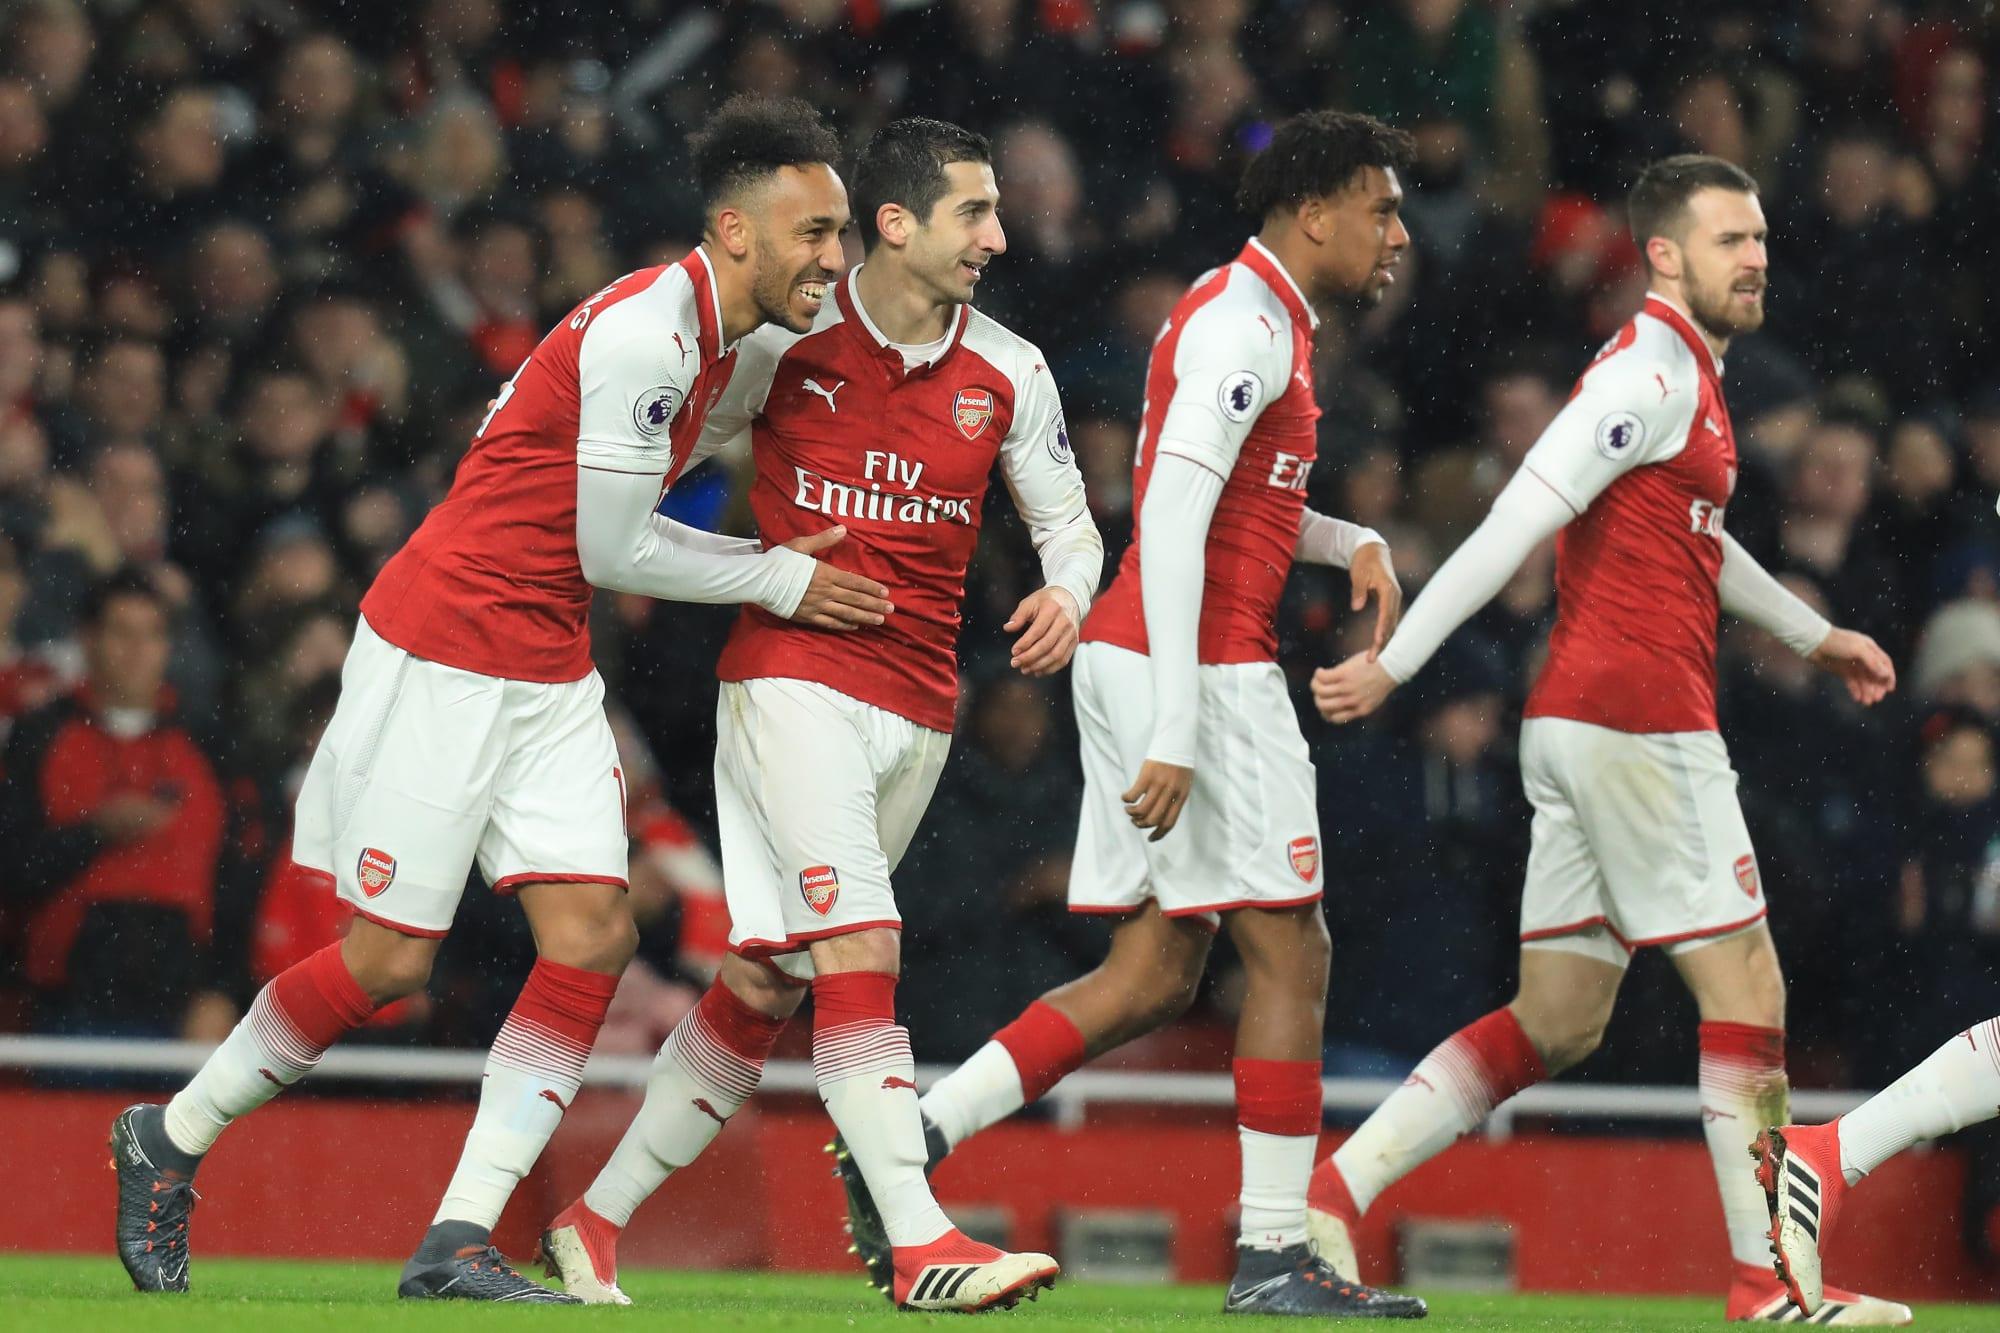 Arsenal 5-1 Everton: Premier League highlights and recap